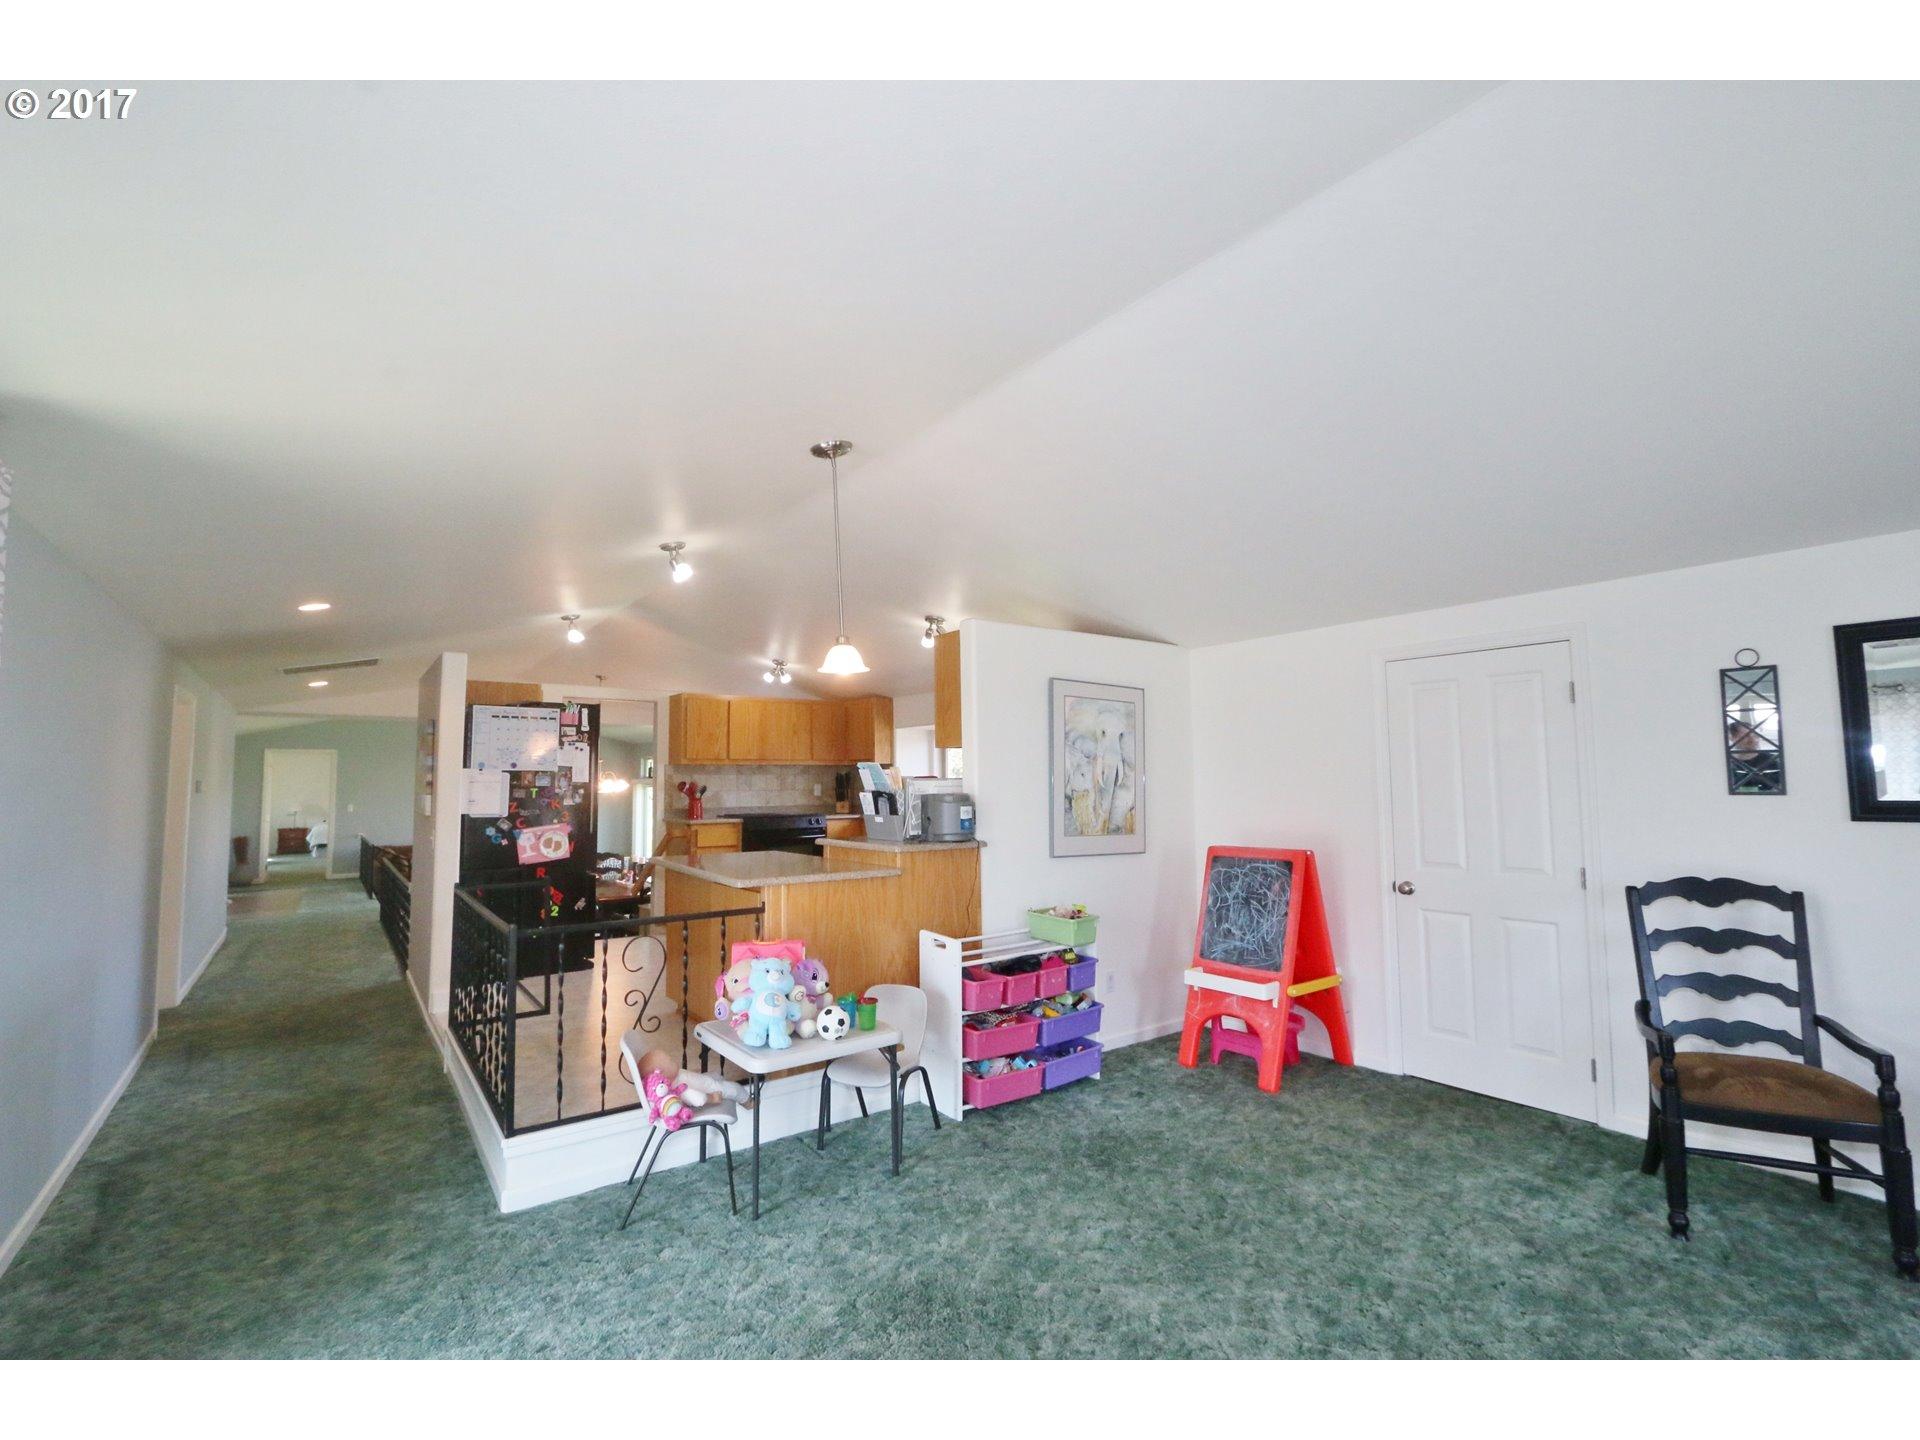 975 PRICEBORO RD Harrisburg, OR 97446 - MLS #: 17175691